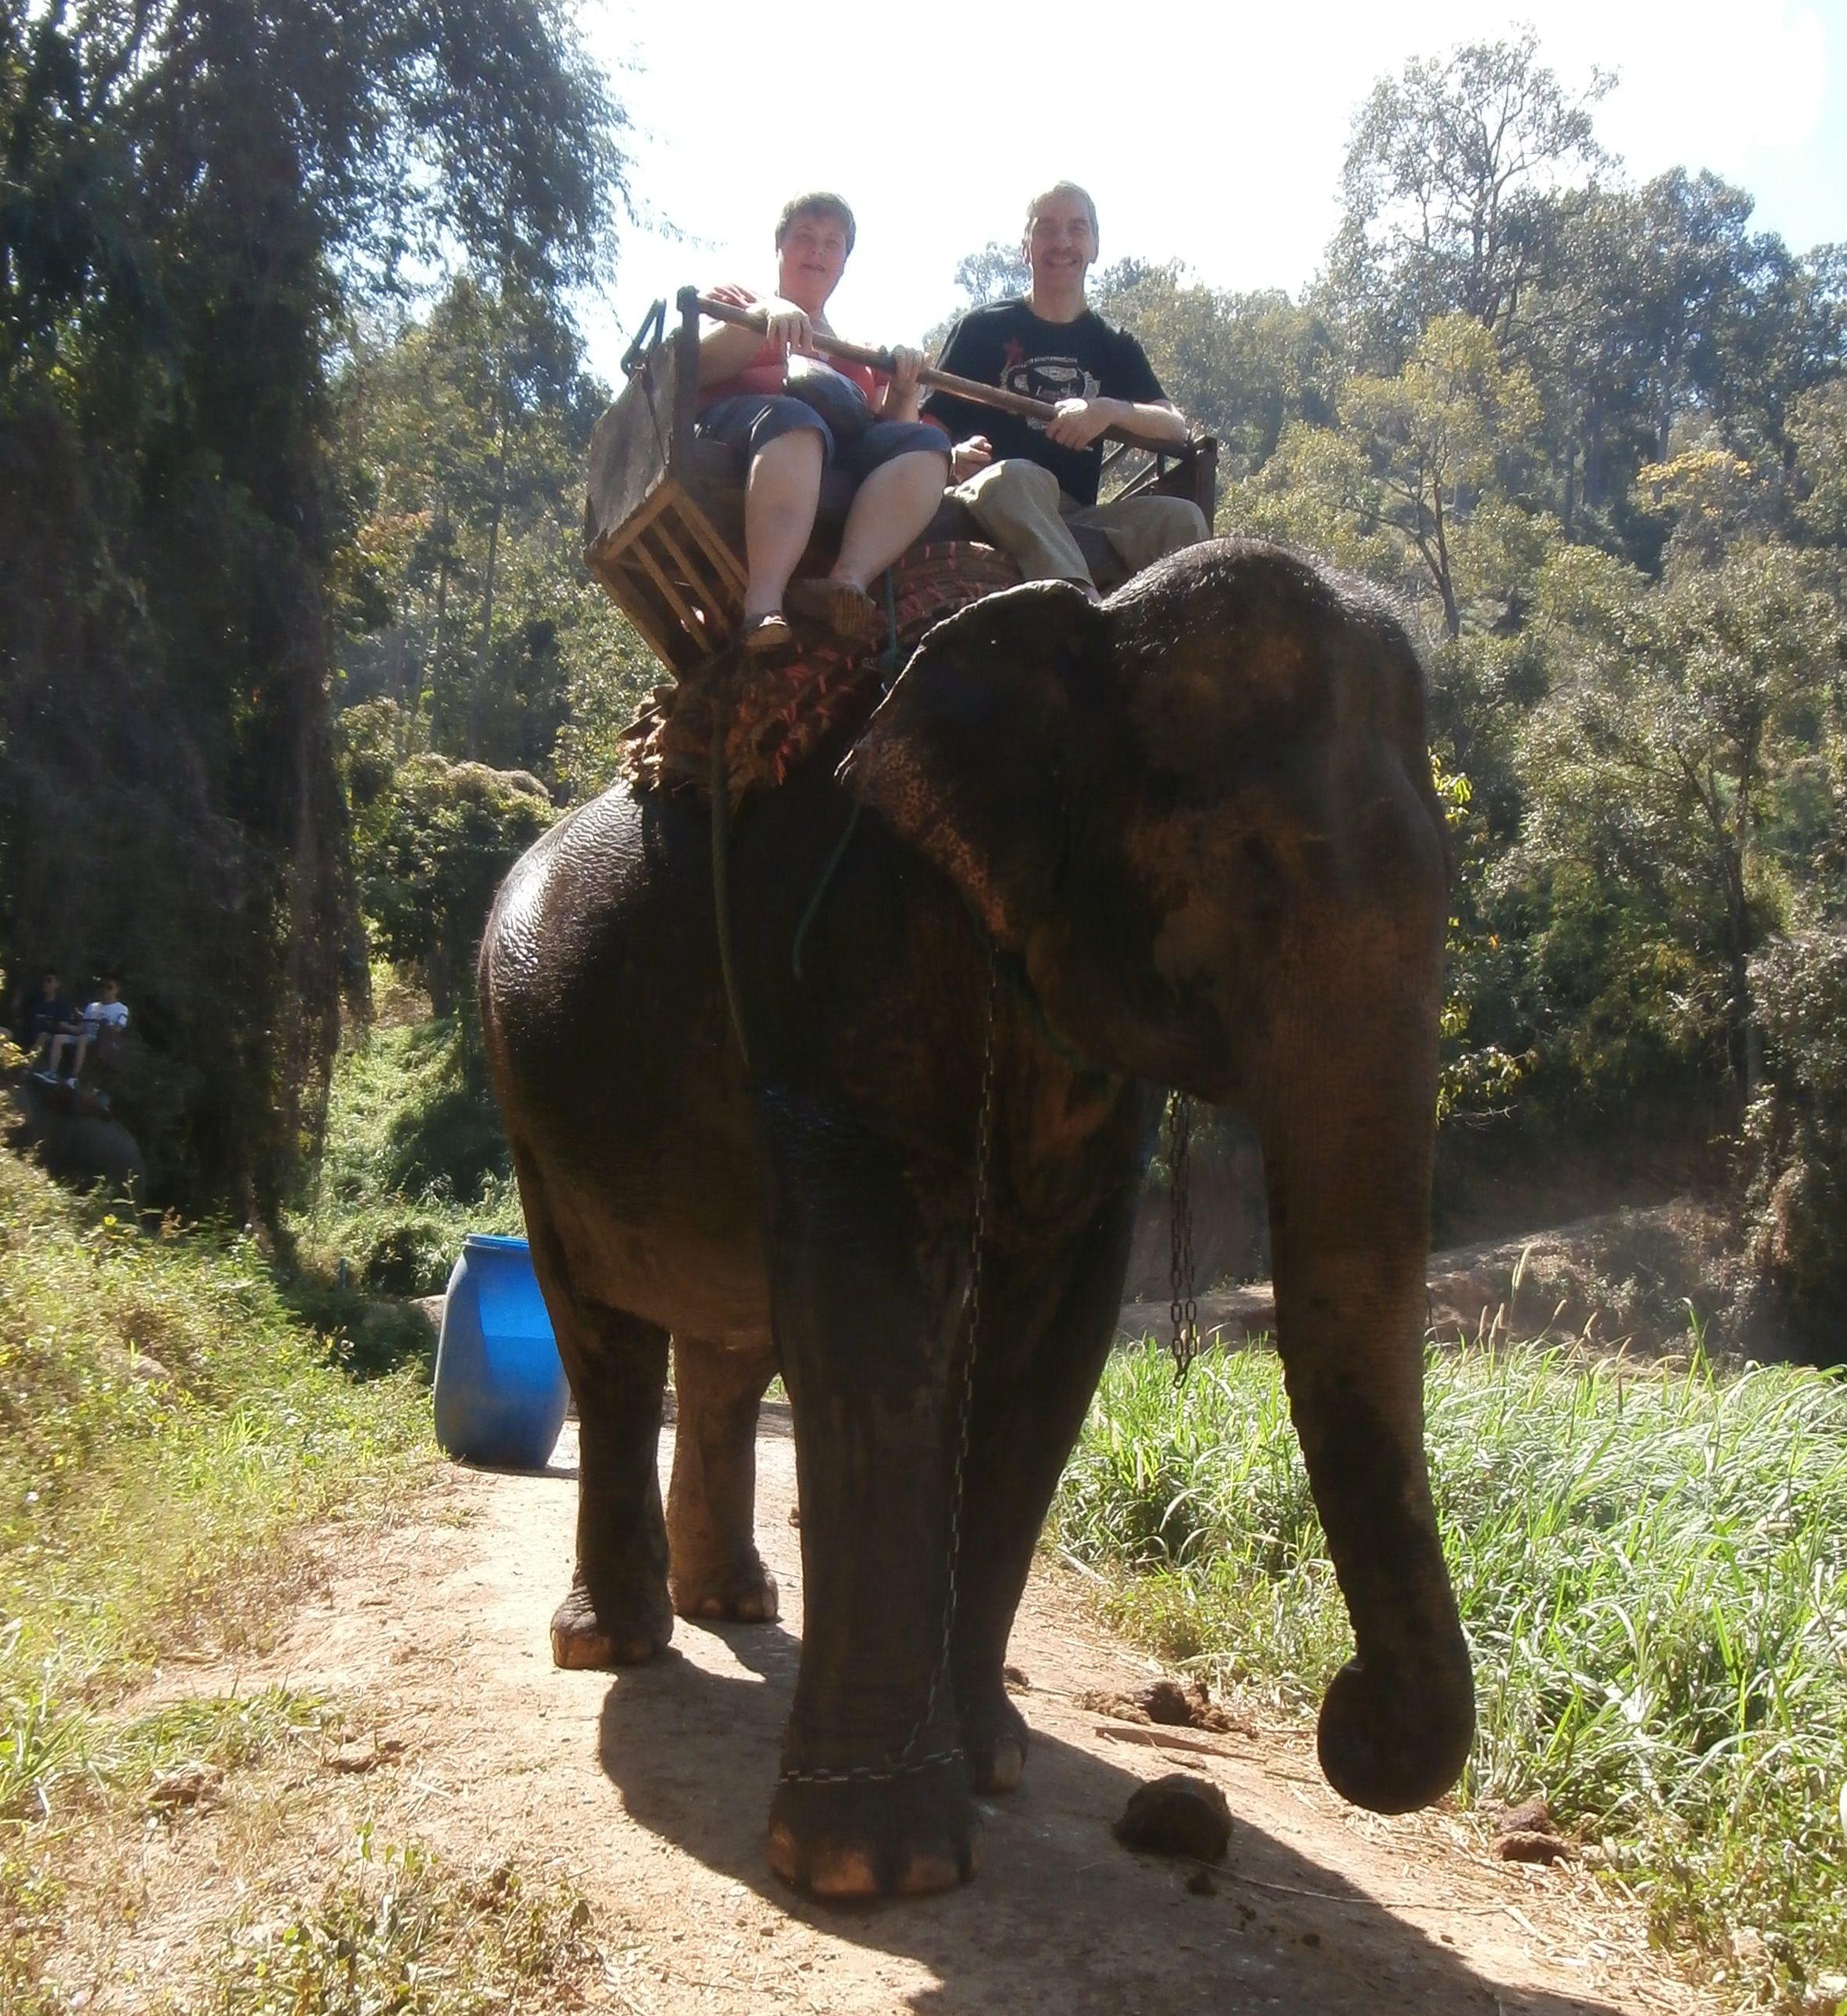 An elephant ride!